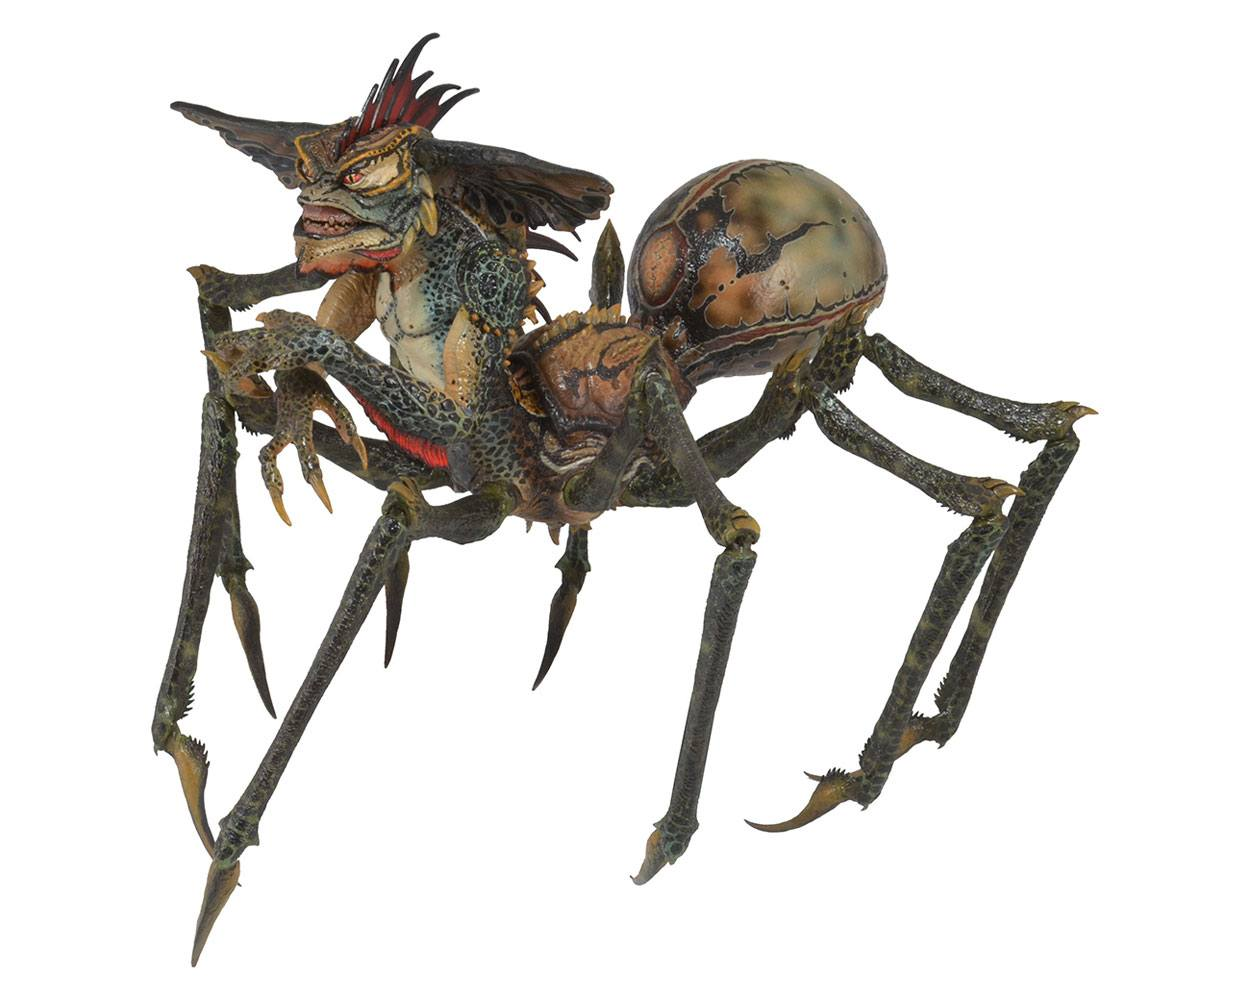 GREMLINS 2 SPIDER GREMLINS DELUXE 10″ Action Figure 25 cm NECA